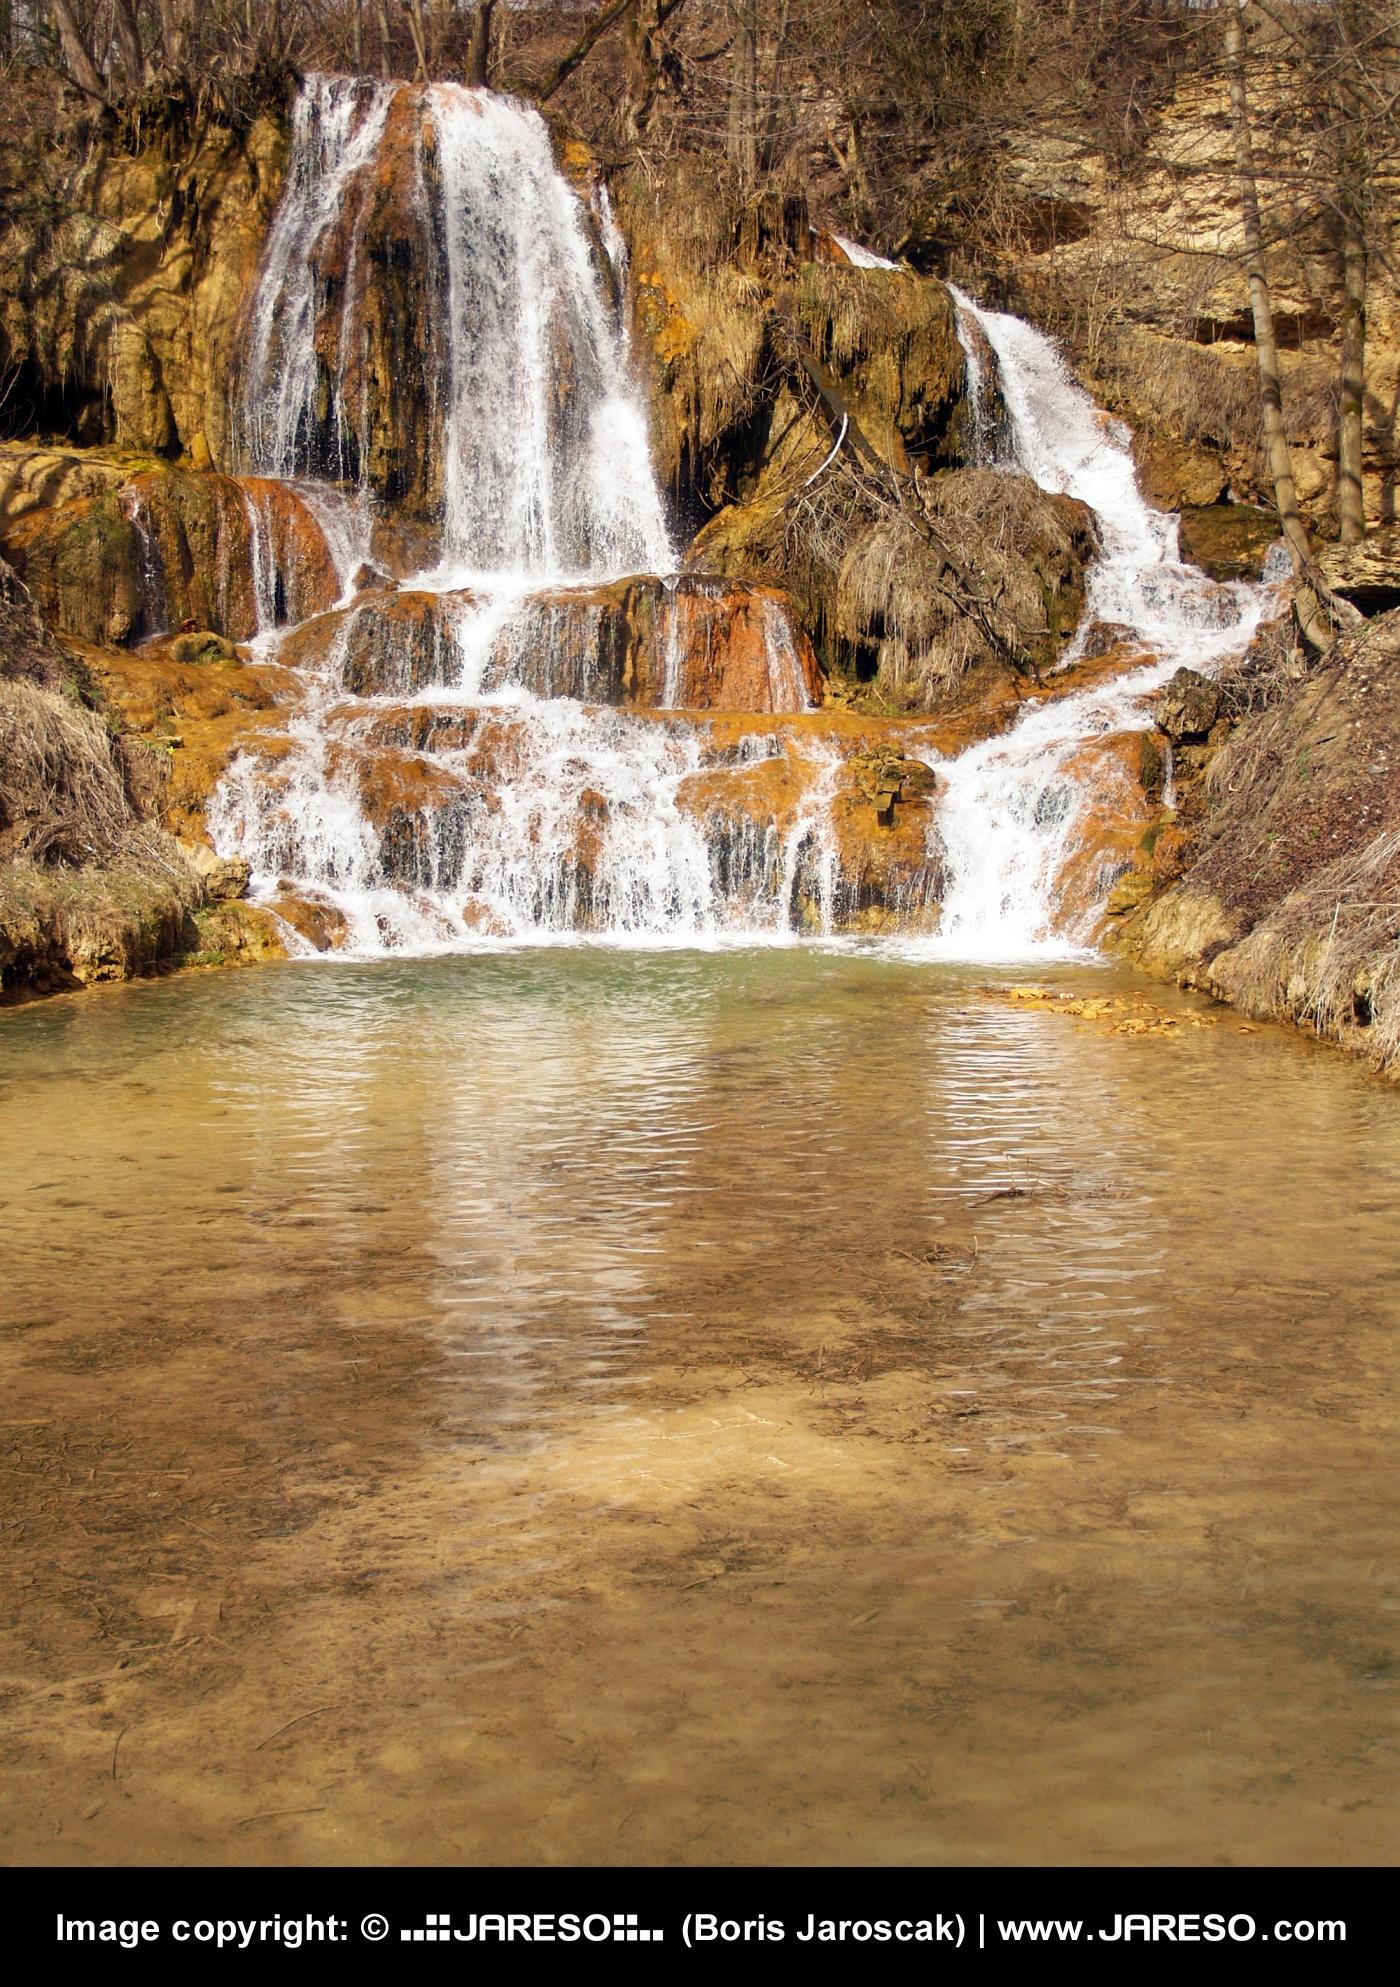 web_gplus_waterfall_lucky_spring_p3157525_3.jpg